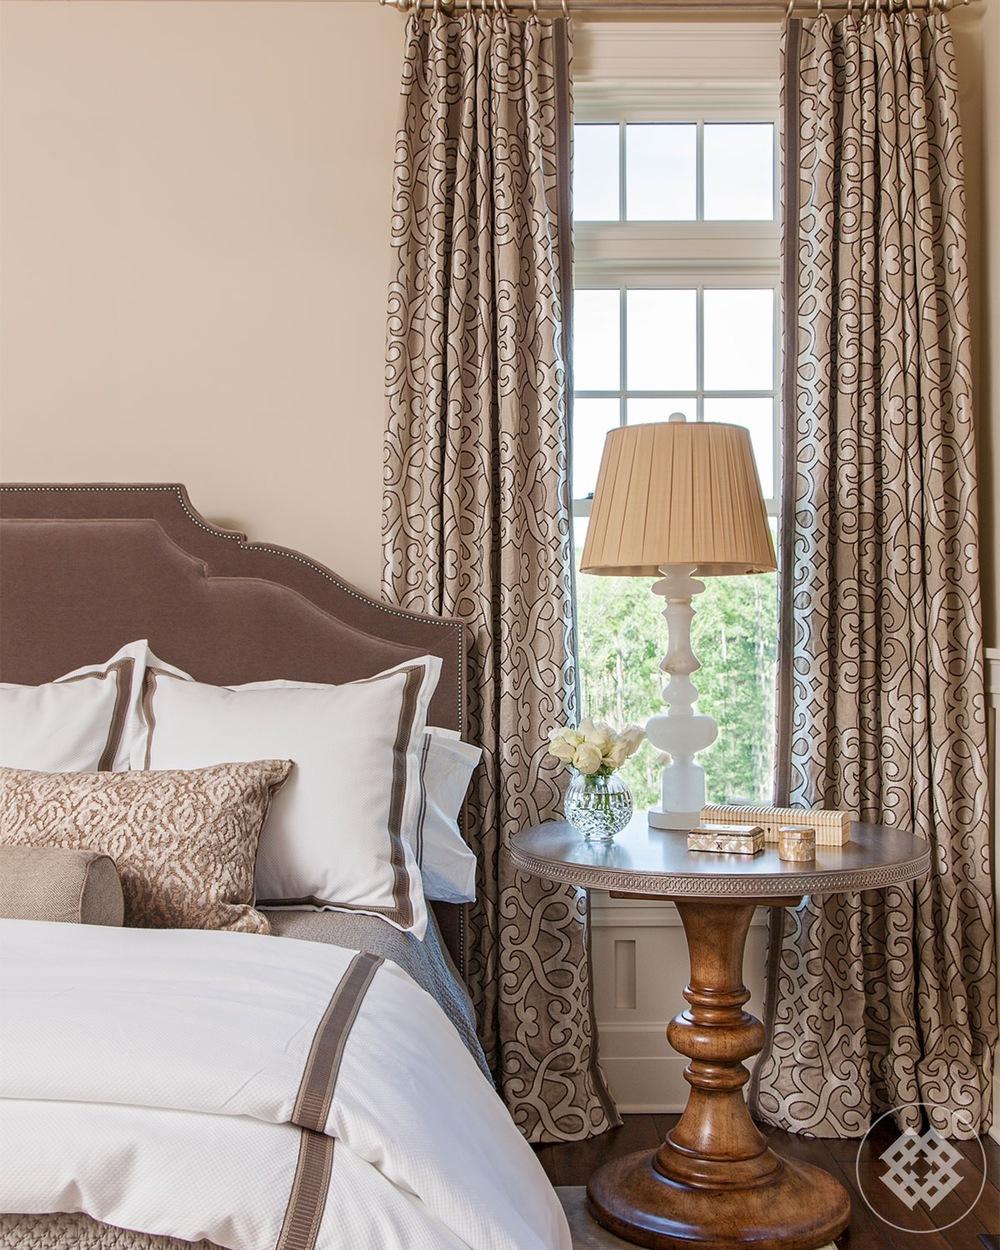 lmr-bedroom237-1200x1500.jpg